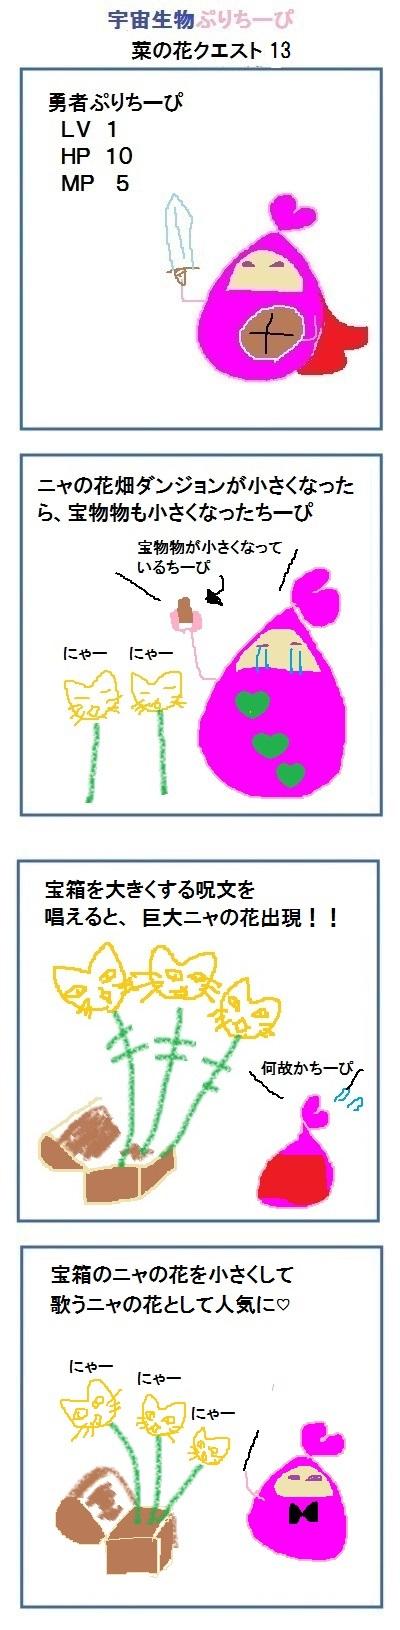 160326_nanohana_quest13.jpg